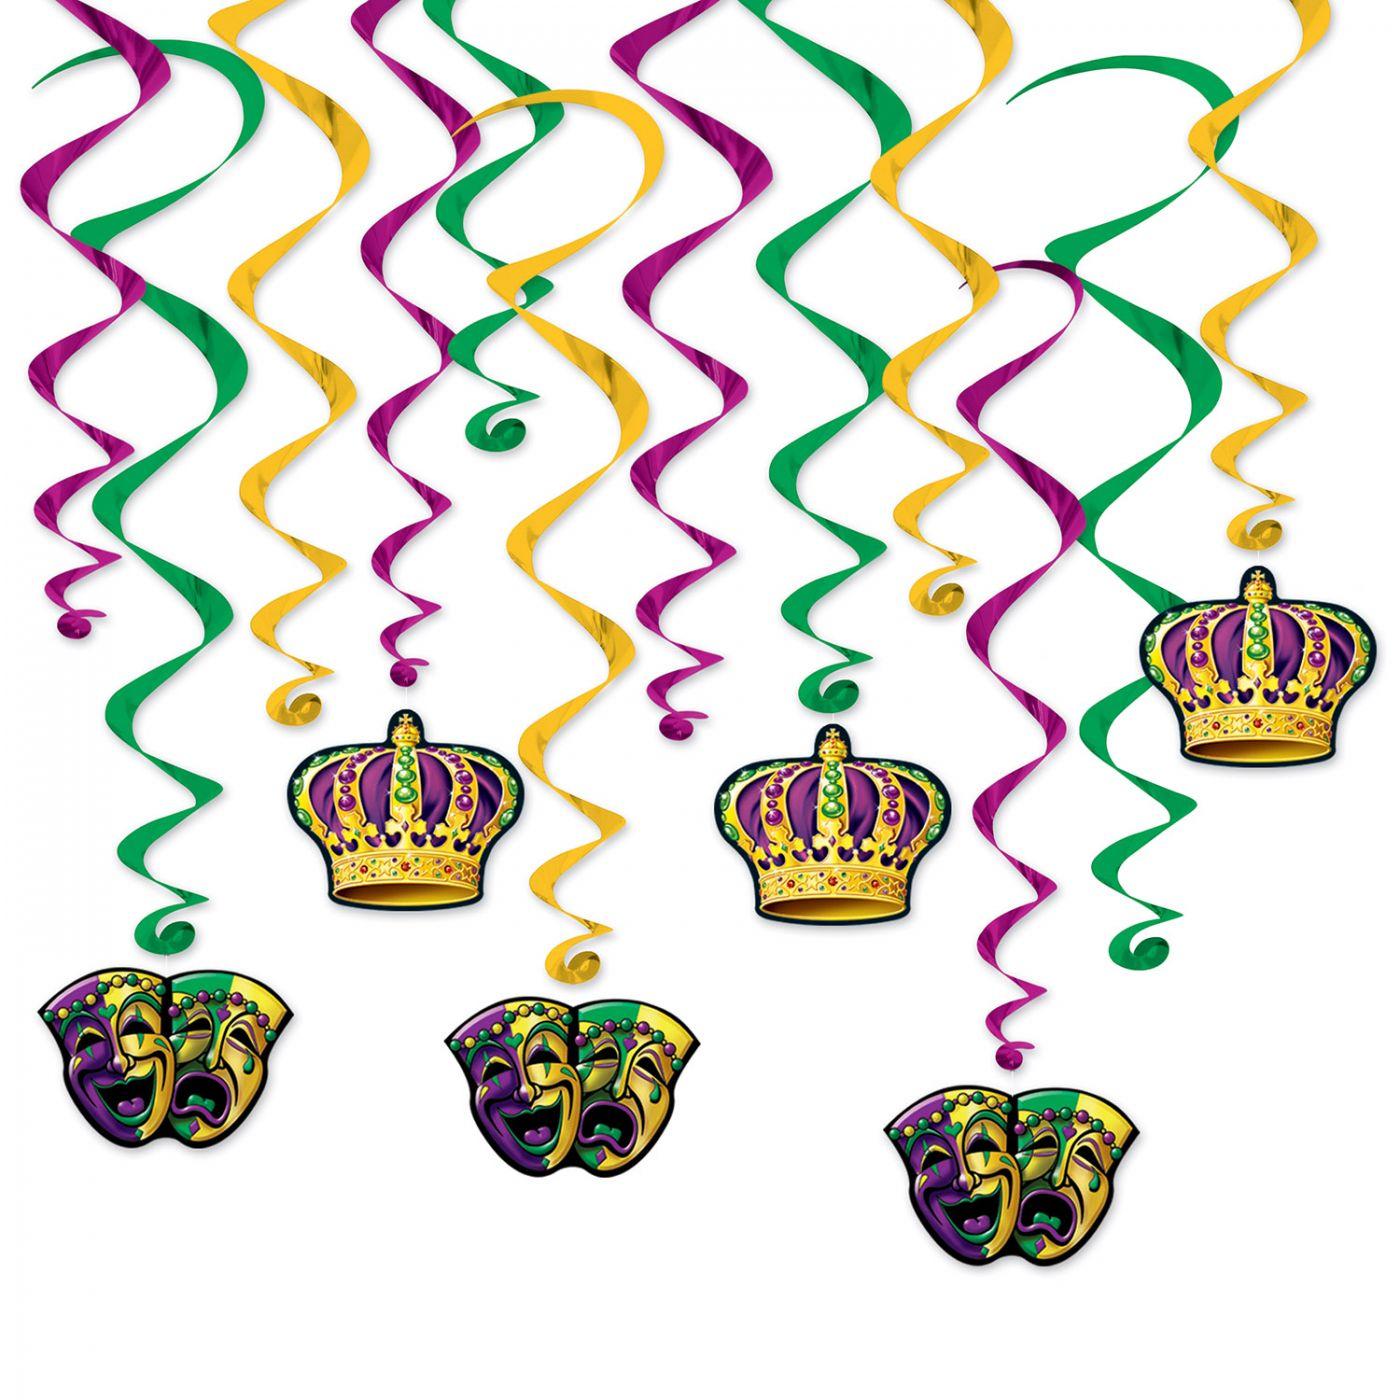 Mardi Gras Whirls image